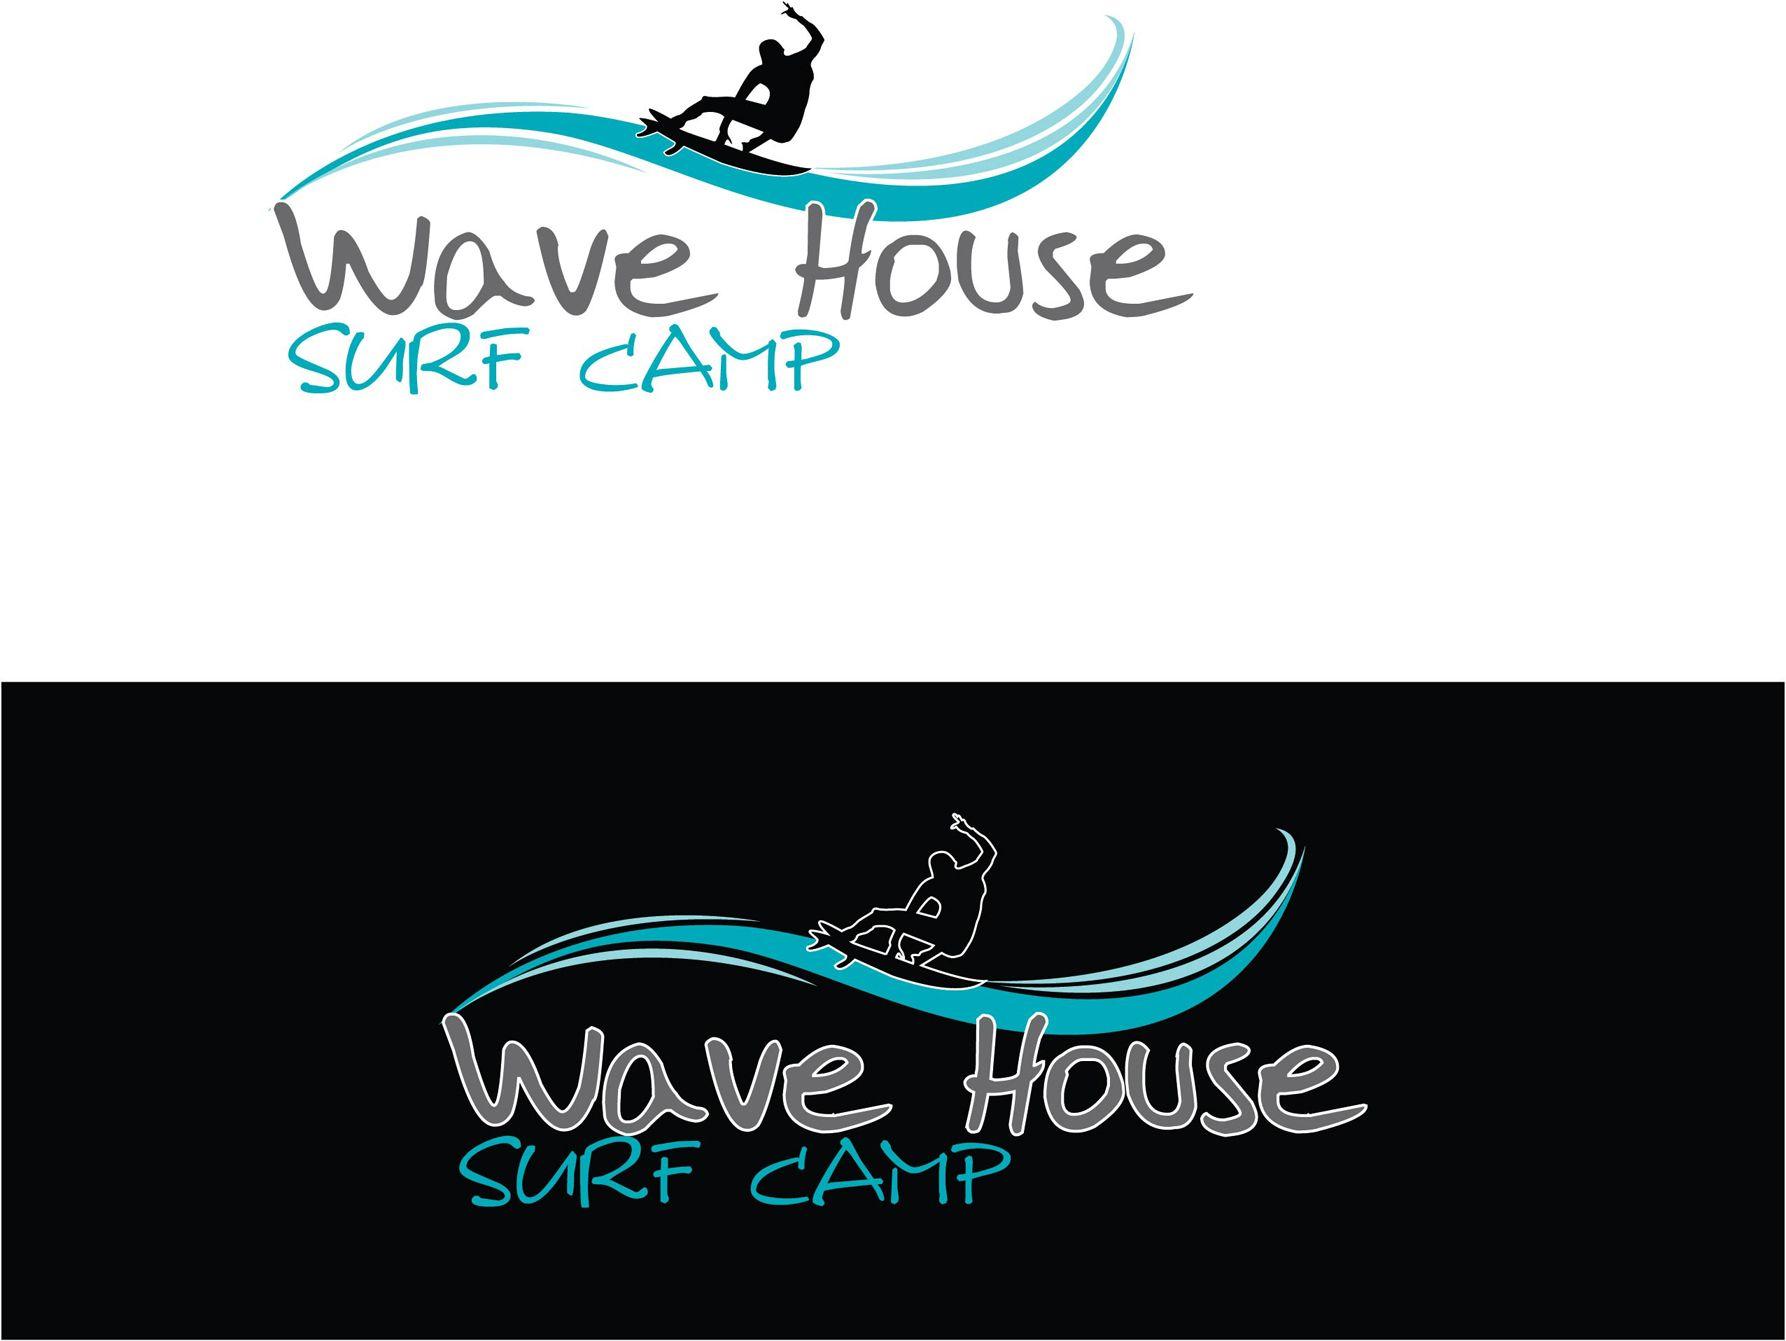 Редизайн логотипа для серф-кэмпа на Бали - дизайнер pups42